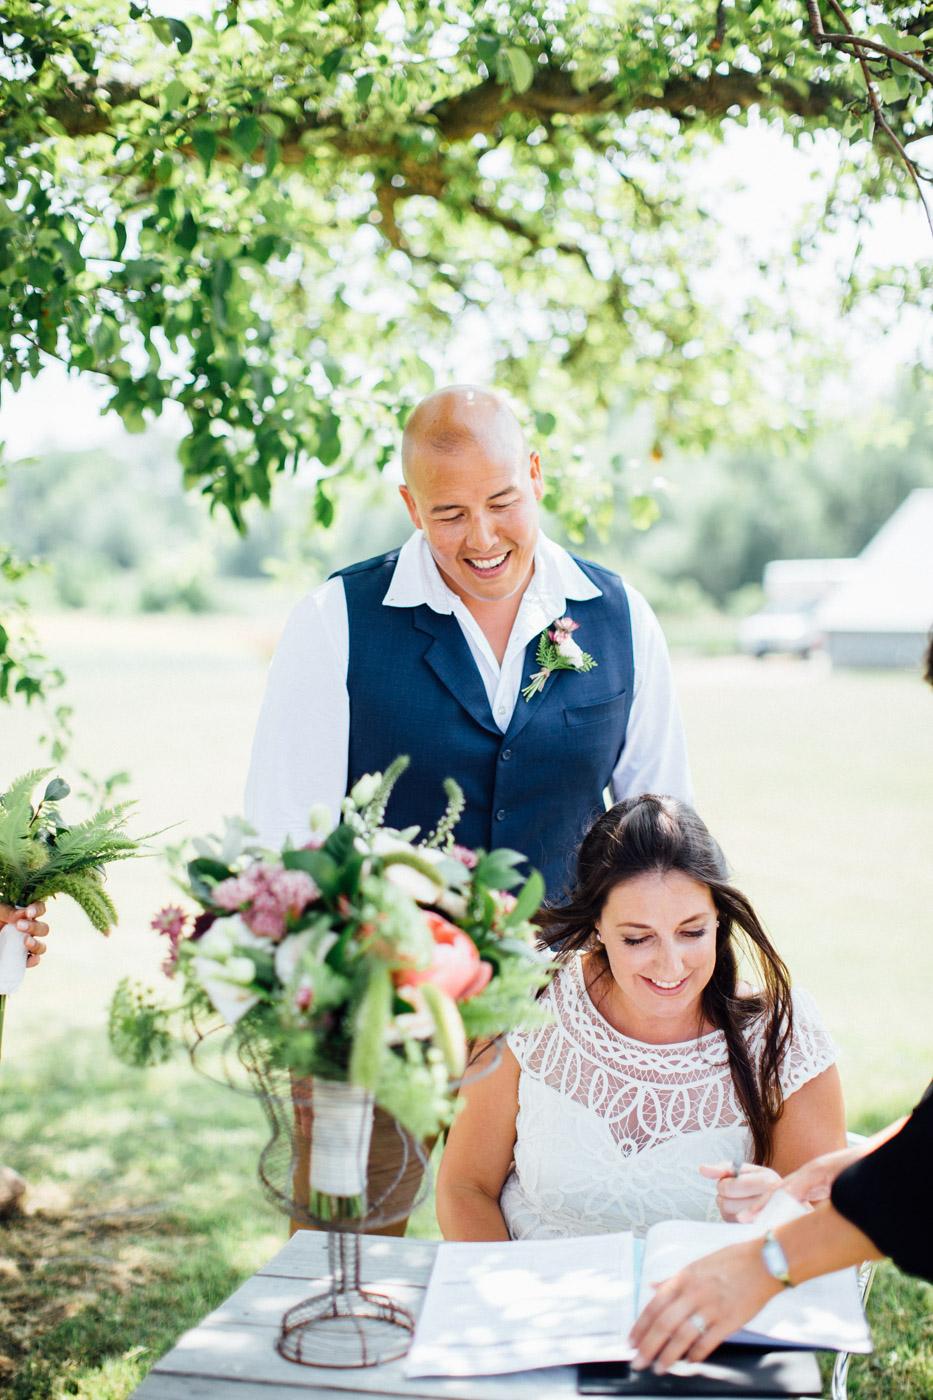 Thera & Barry Wedding 2016-203.jpg